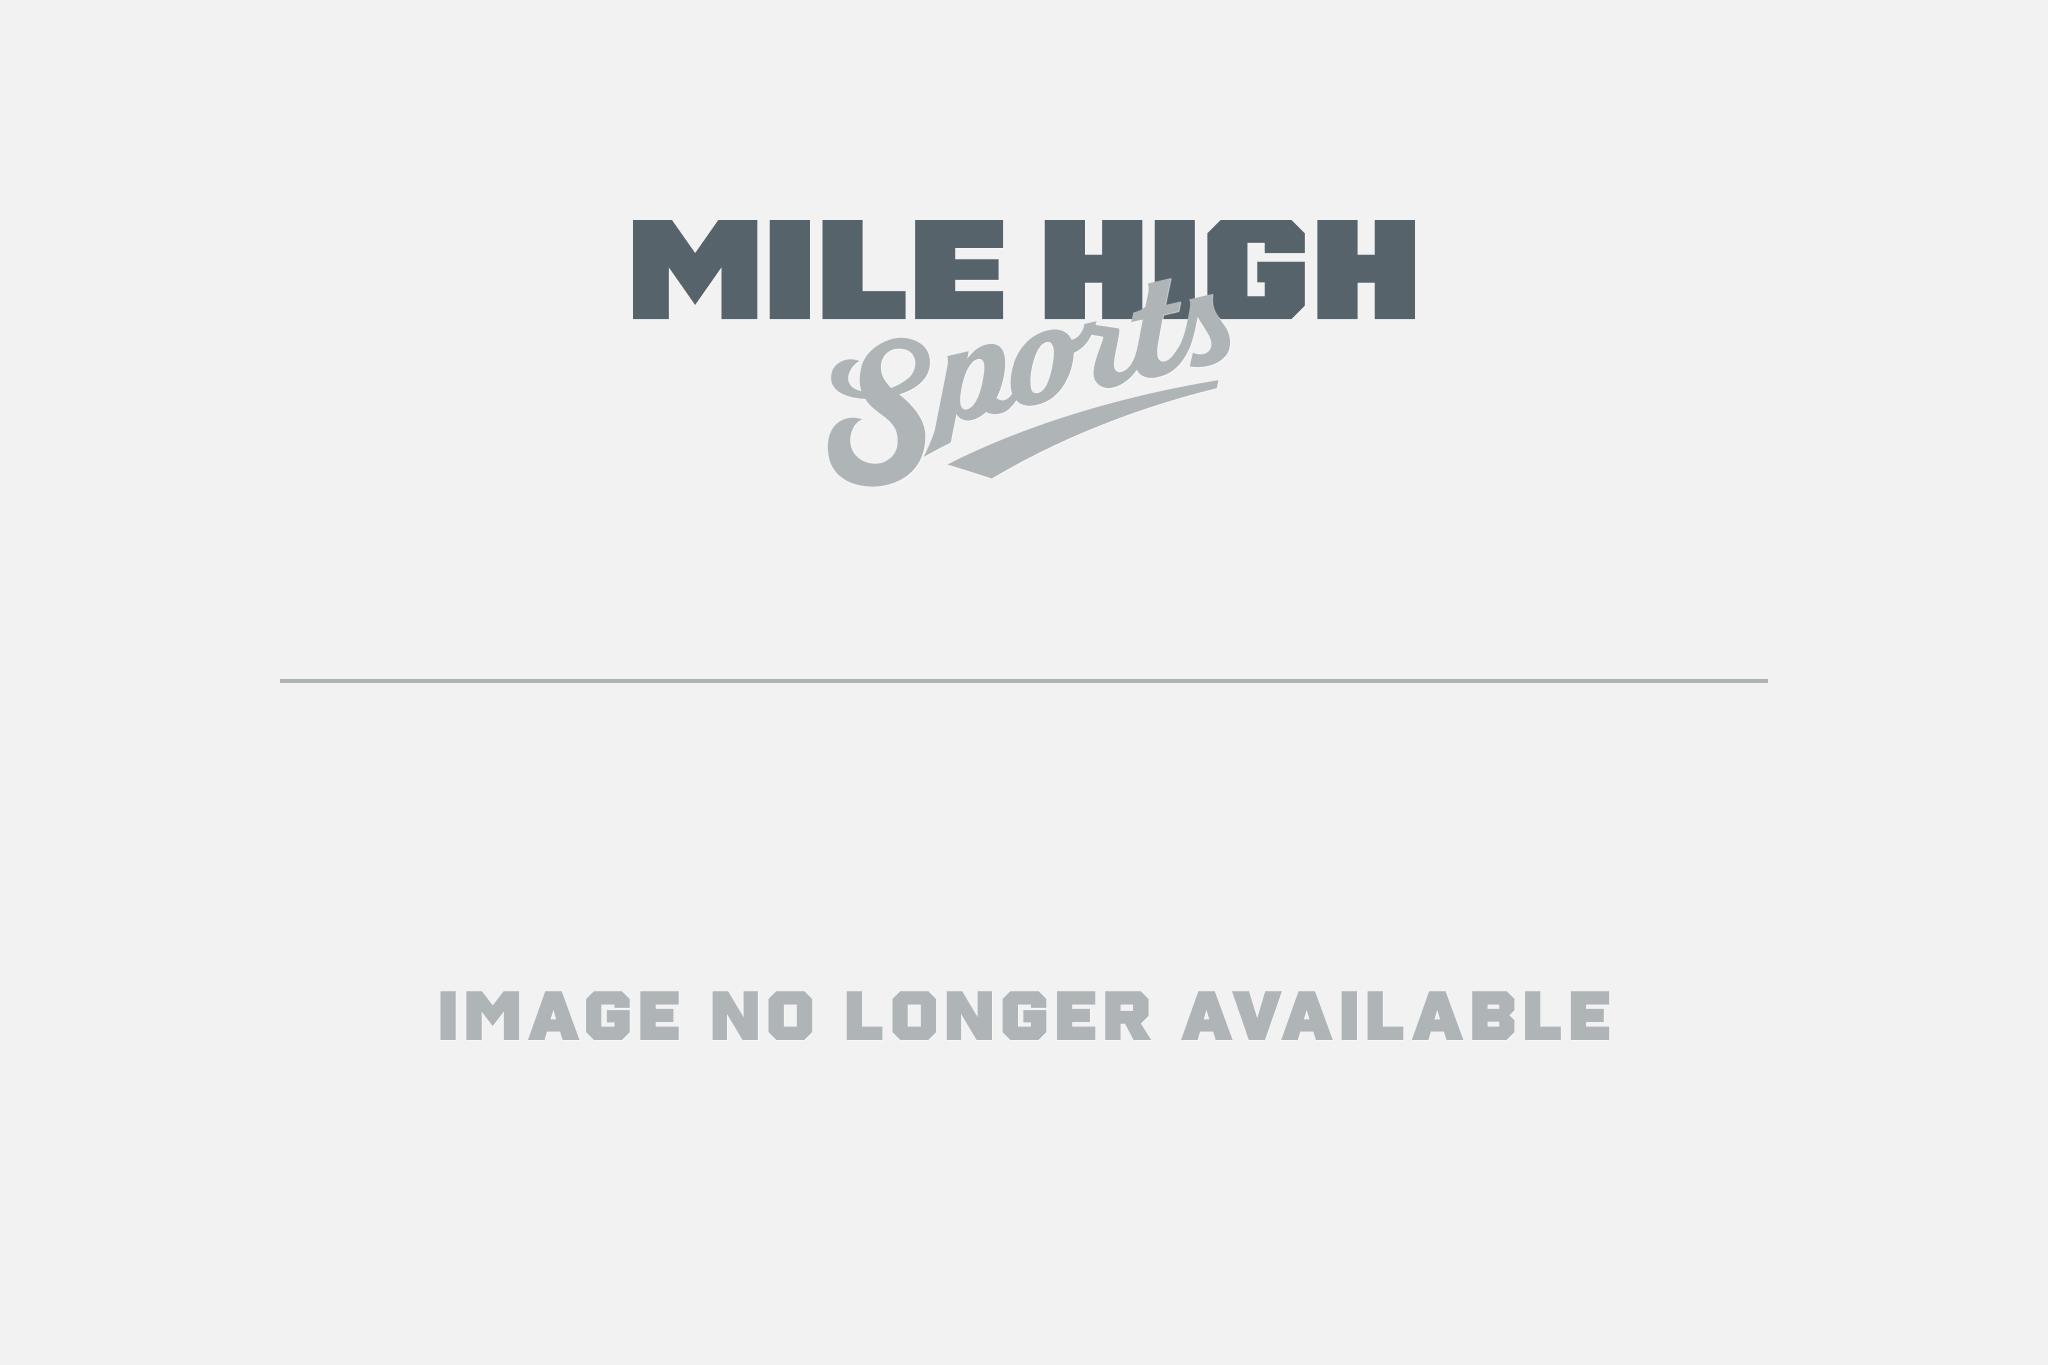 NCHC: No. 1 Denver Hockey Enters Postseason On 11-game Winning Streak